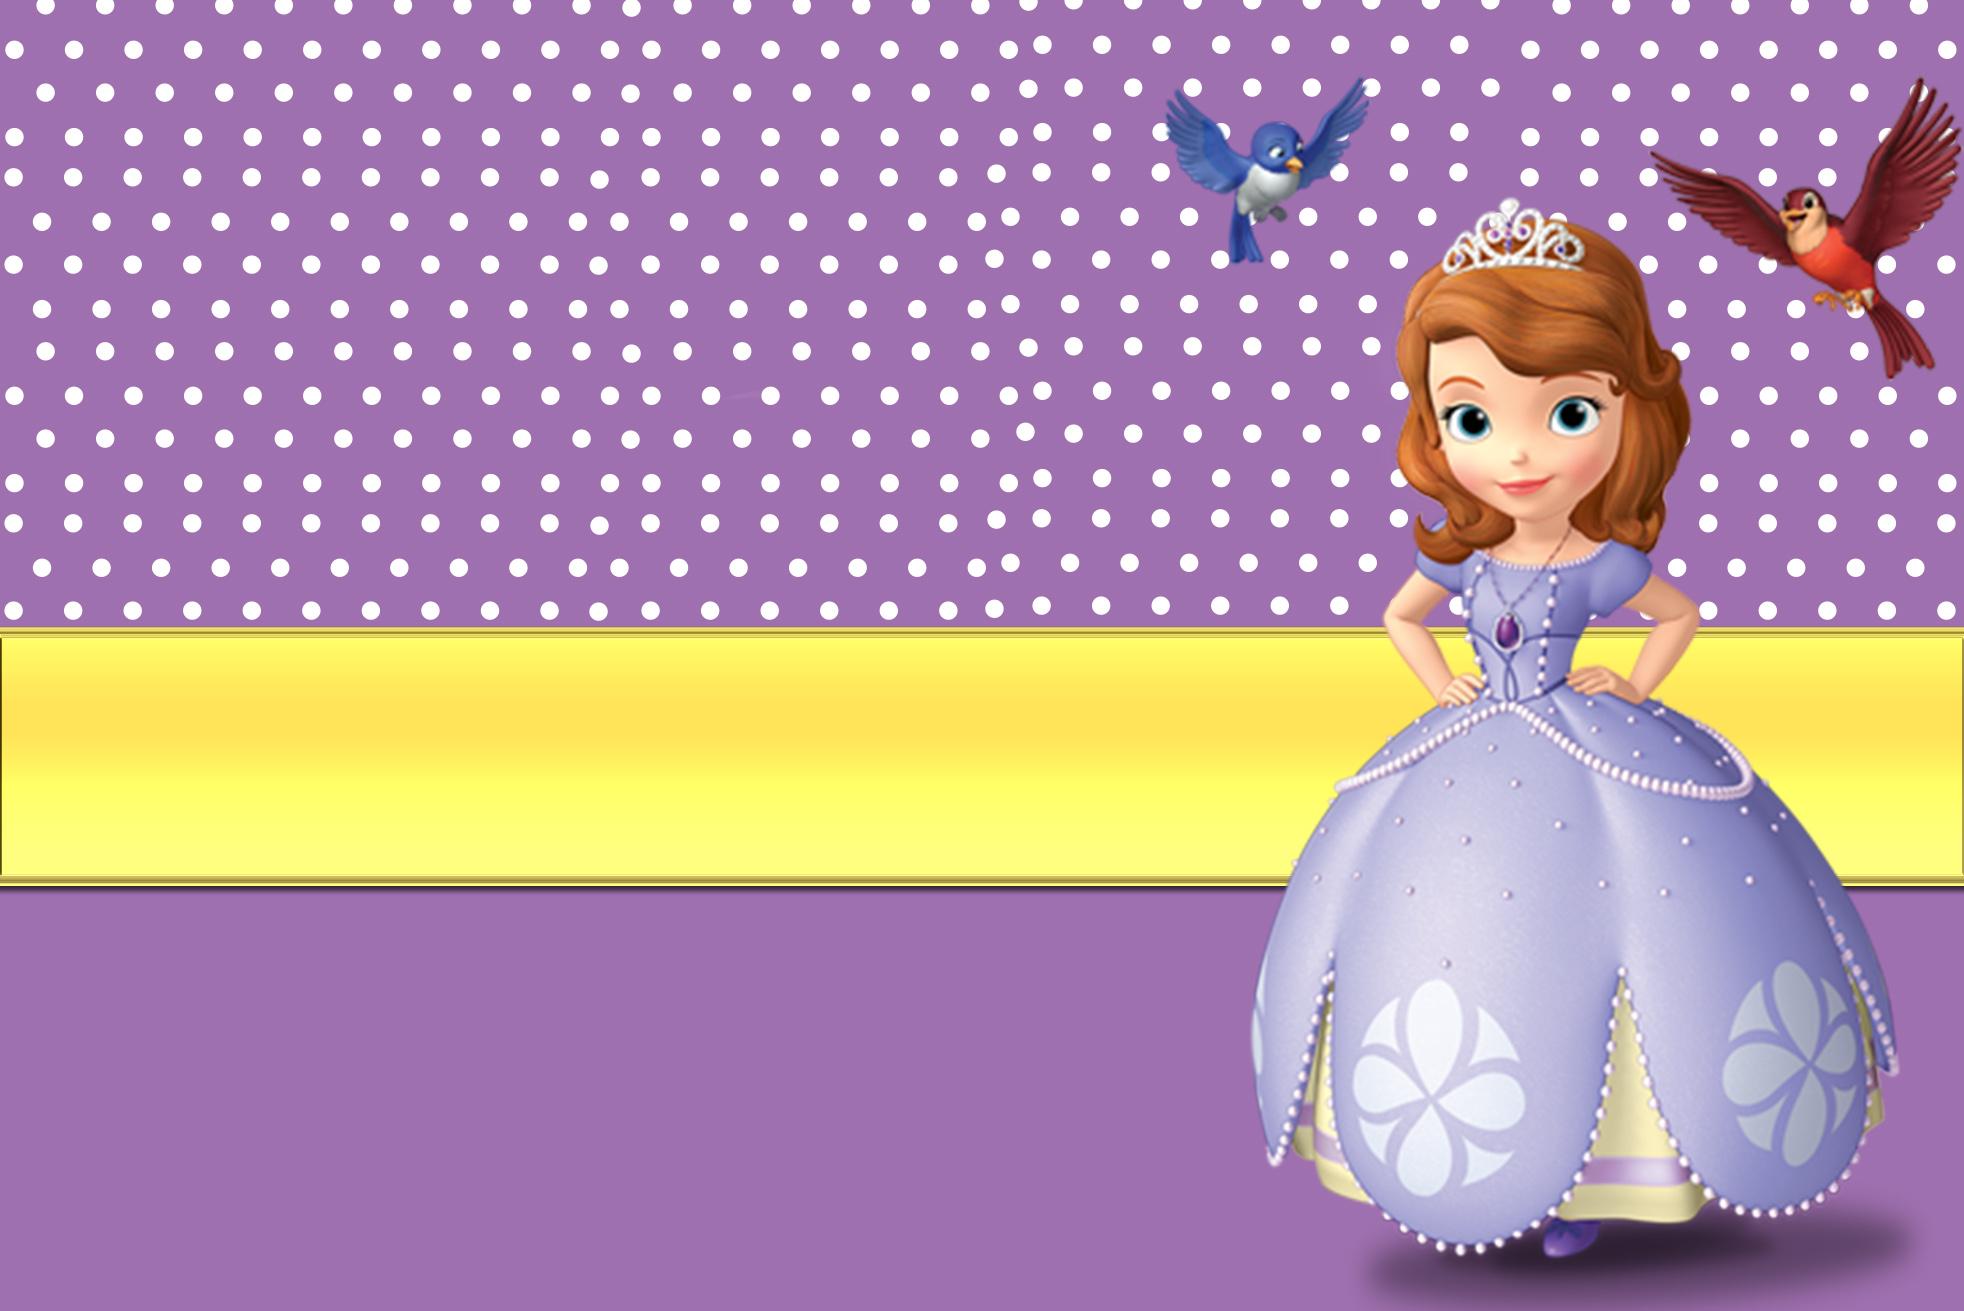 Princessa sofia / Tissue rolls